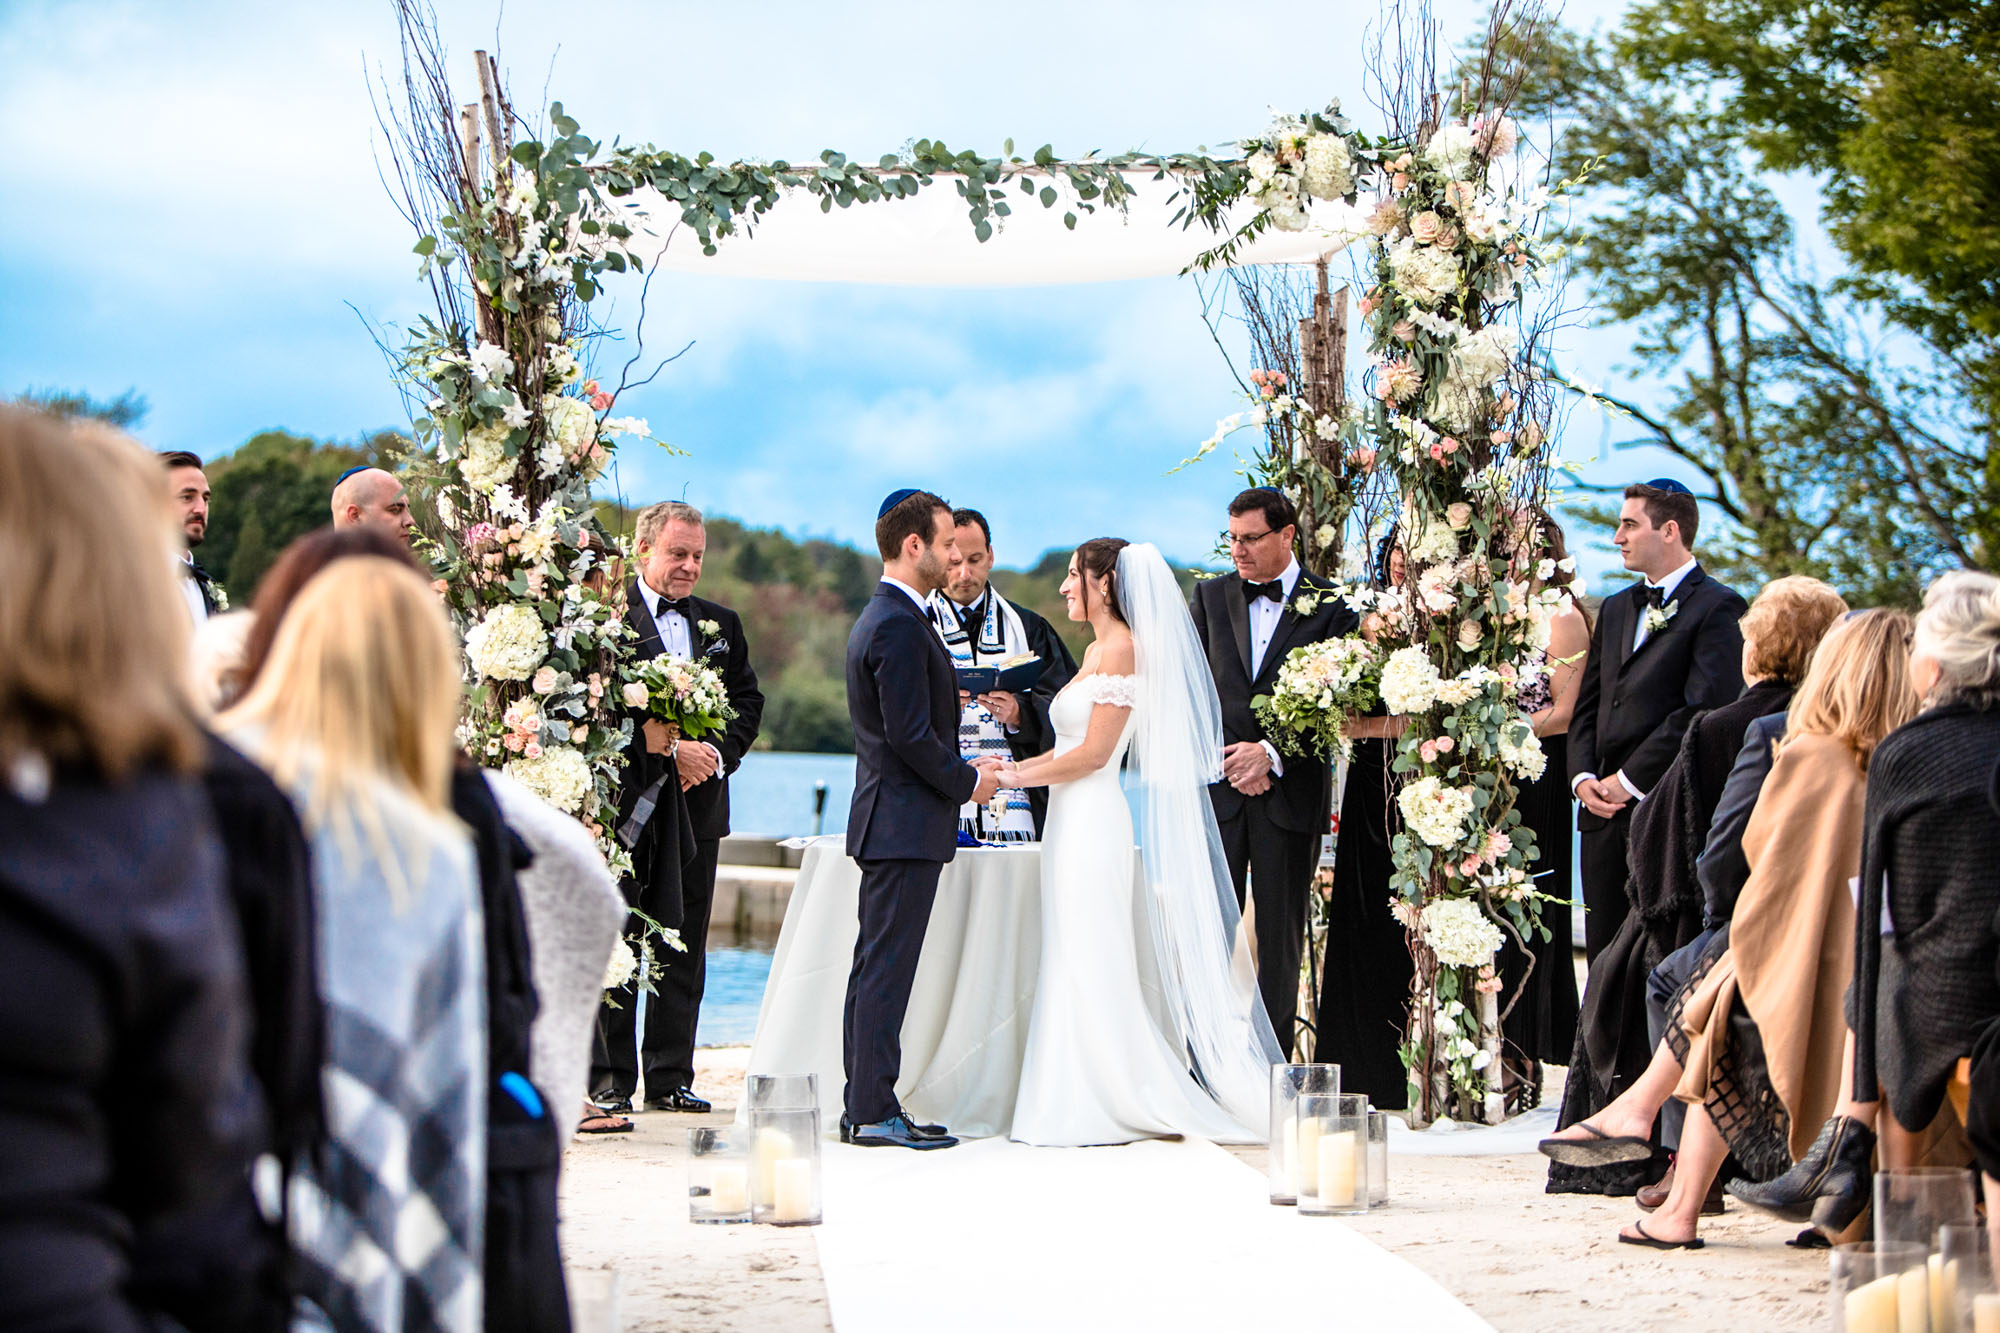 scranton_wedding_photographer_lettieri_pa (27 of 34).jpg